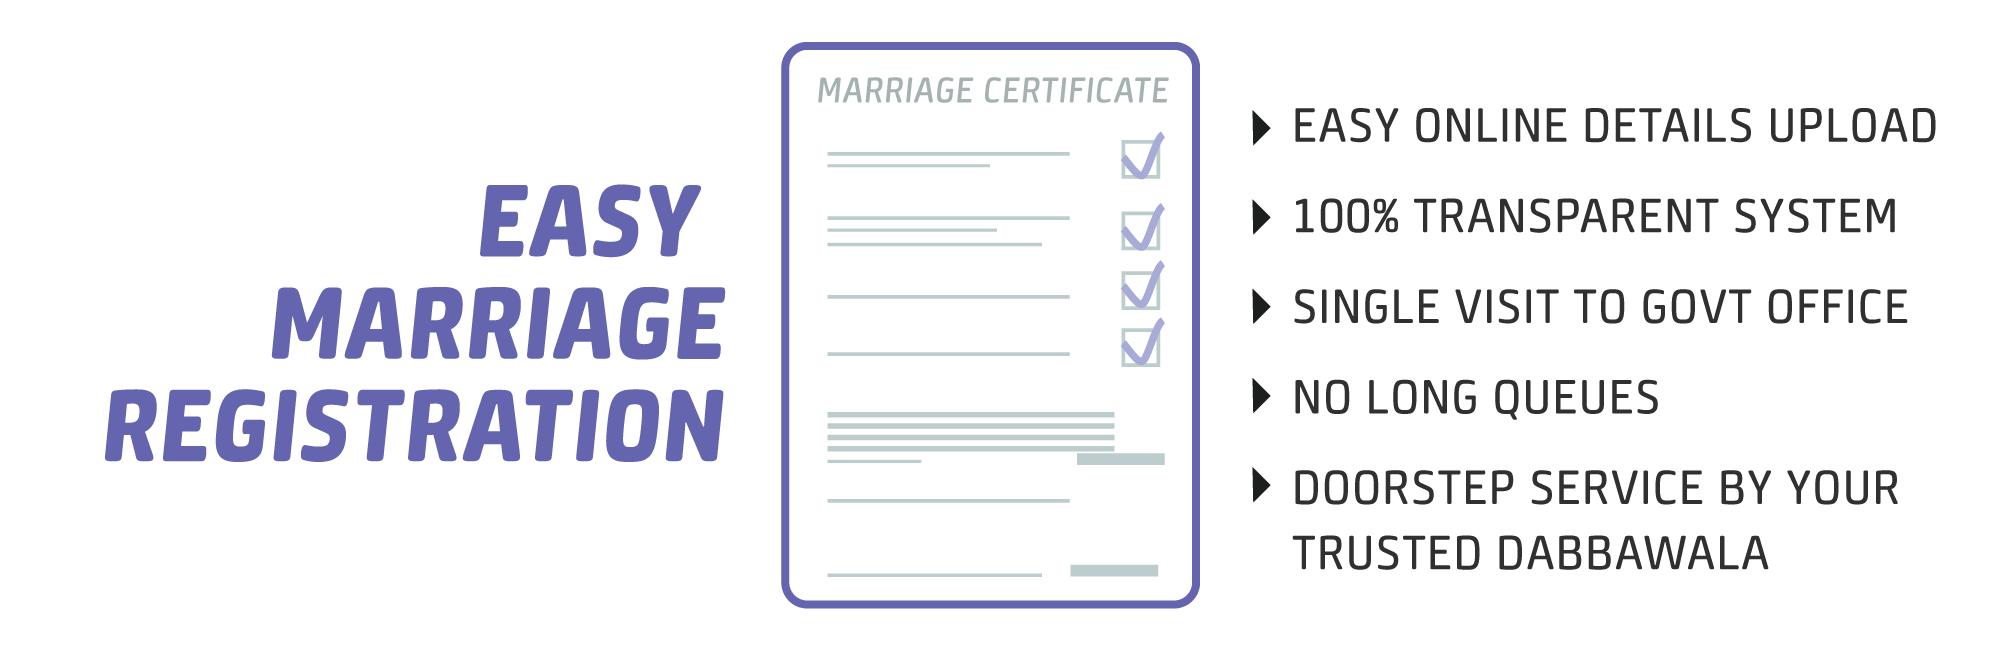 Digital Dabbawala Marriage Registration